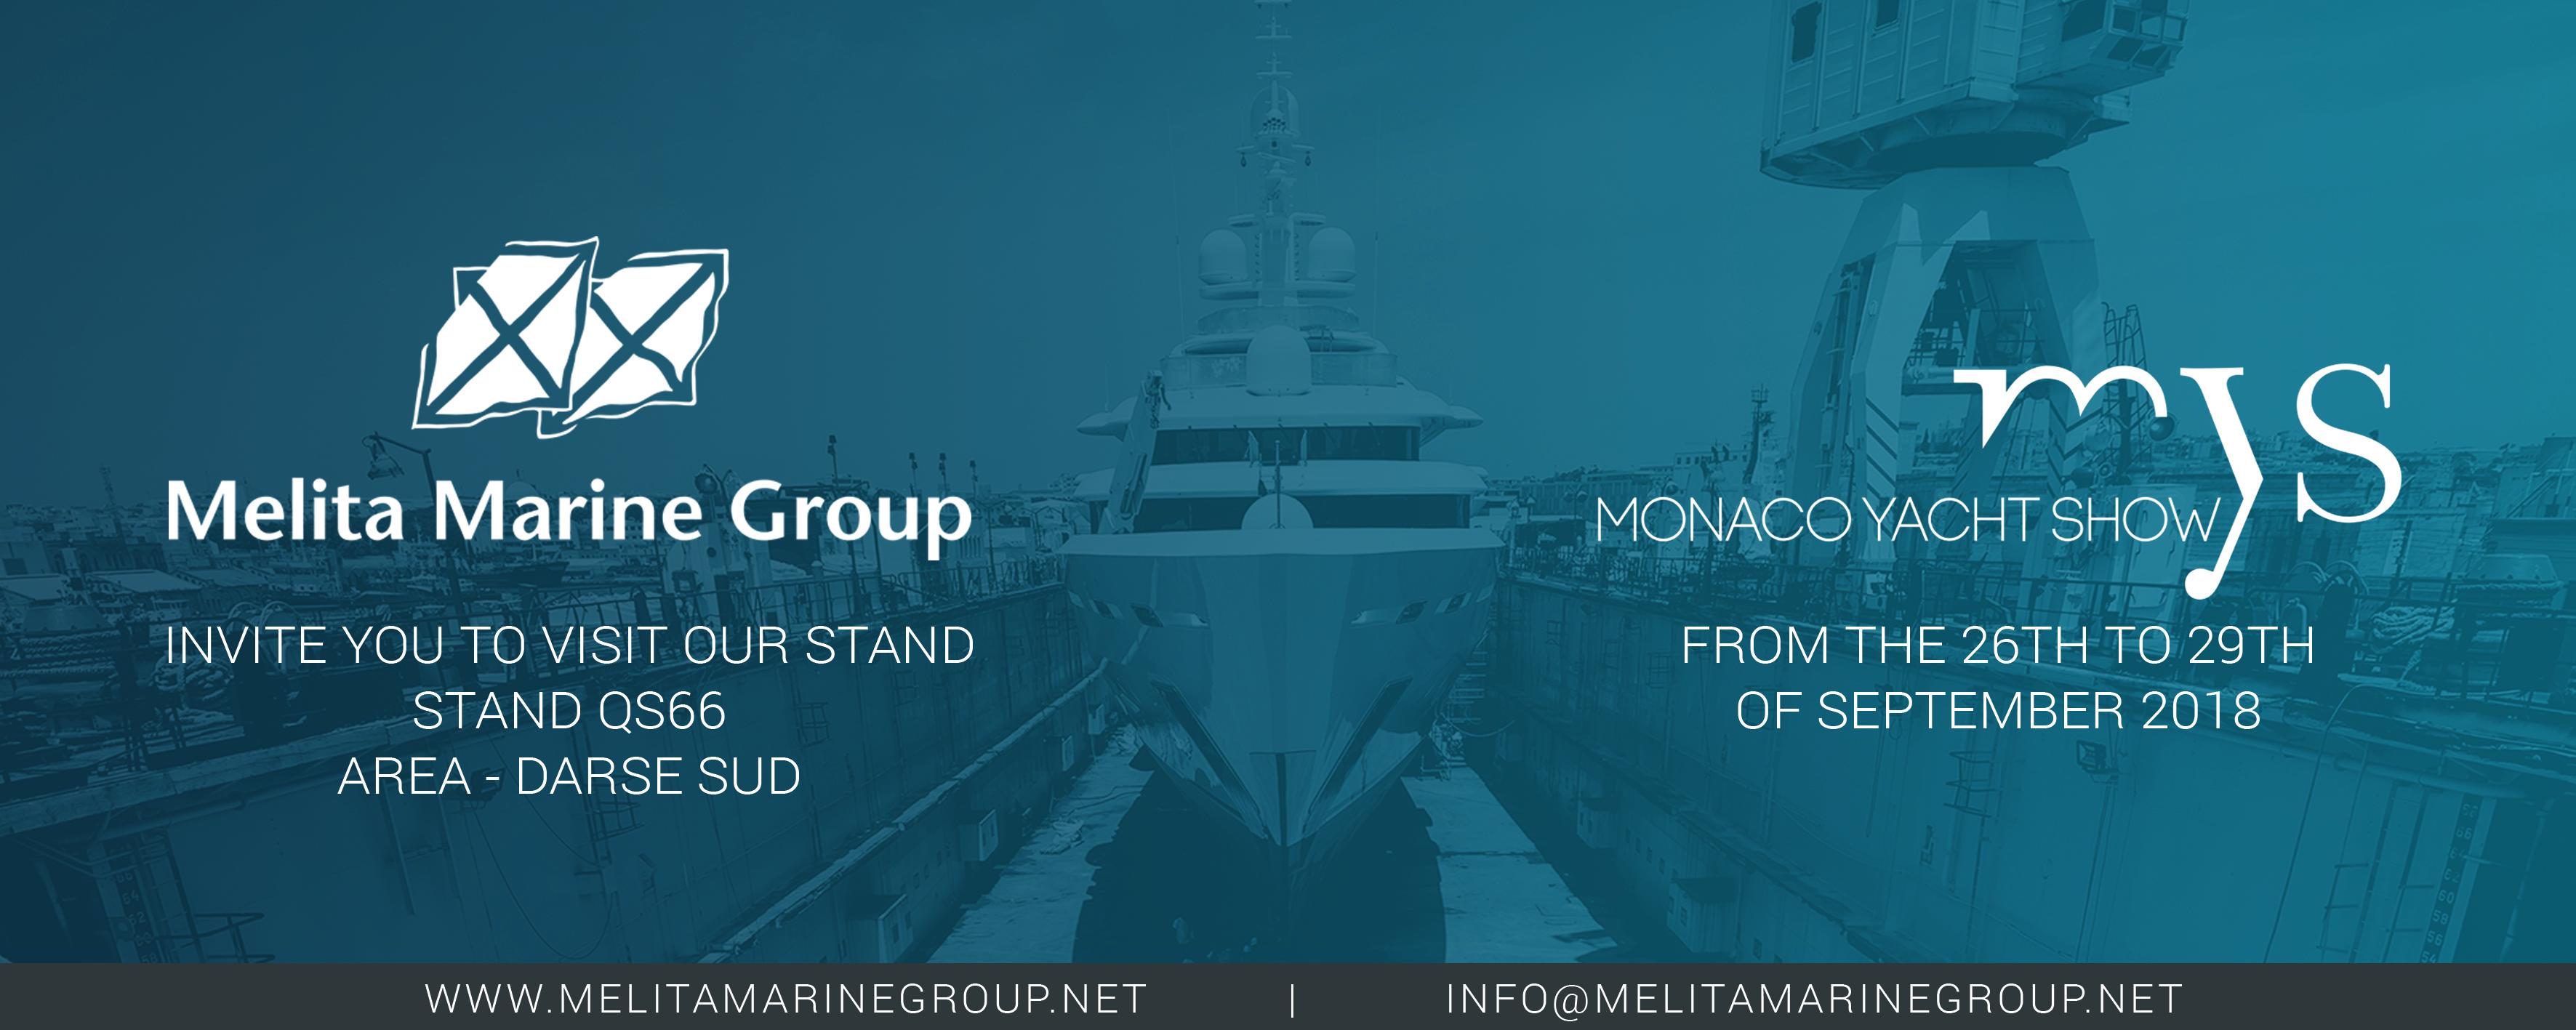 Monaco Yacht Show 2018 - Melita Marine Group